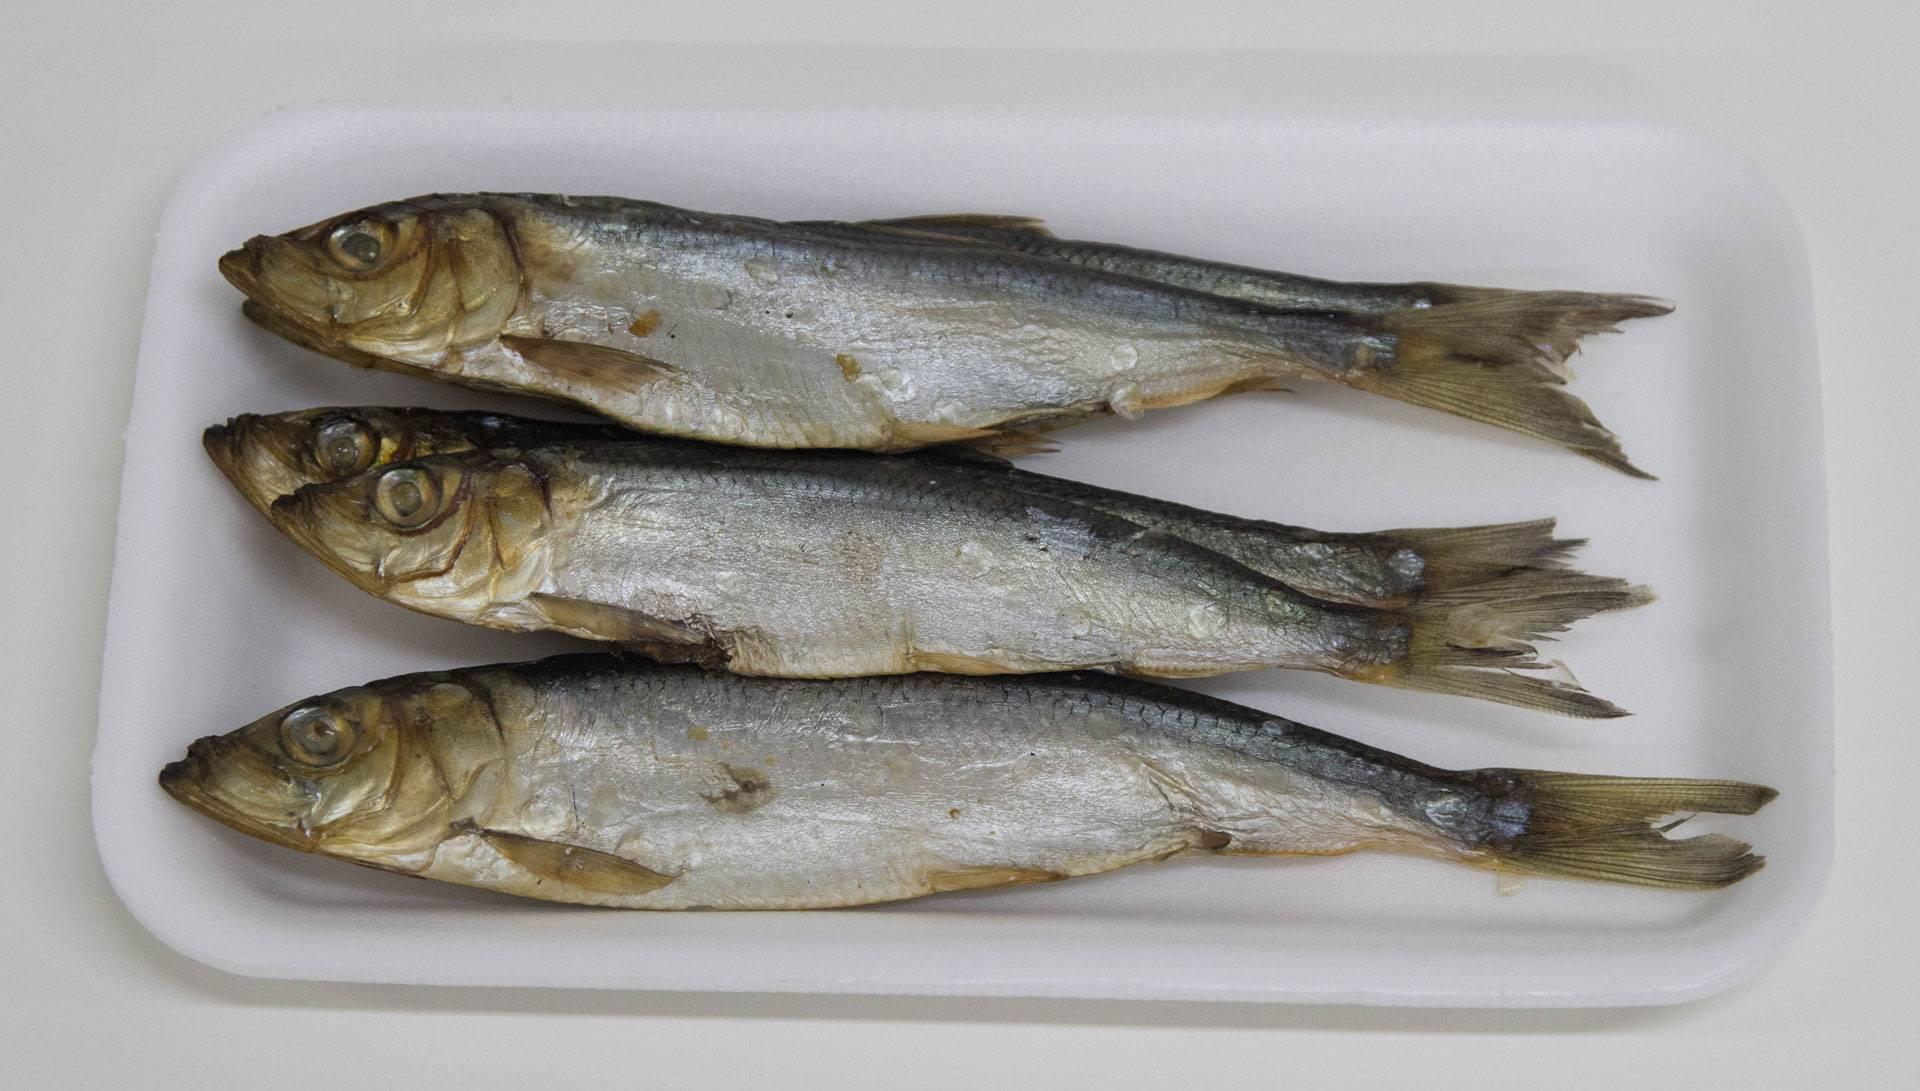 Салака (рыба): польза и вред